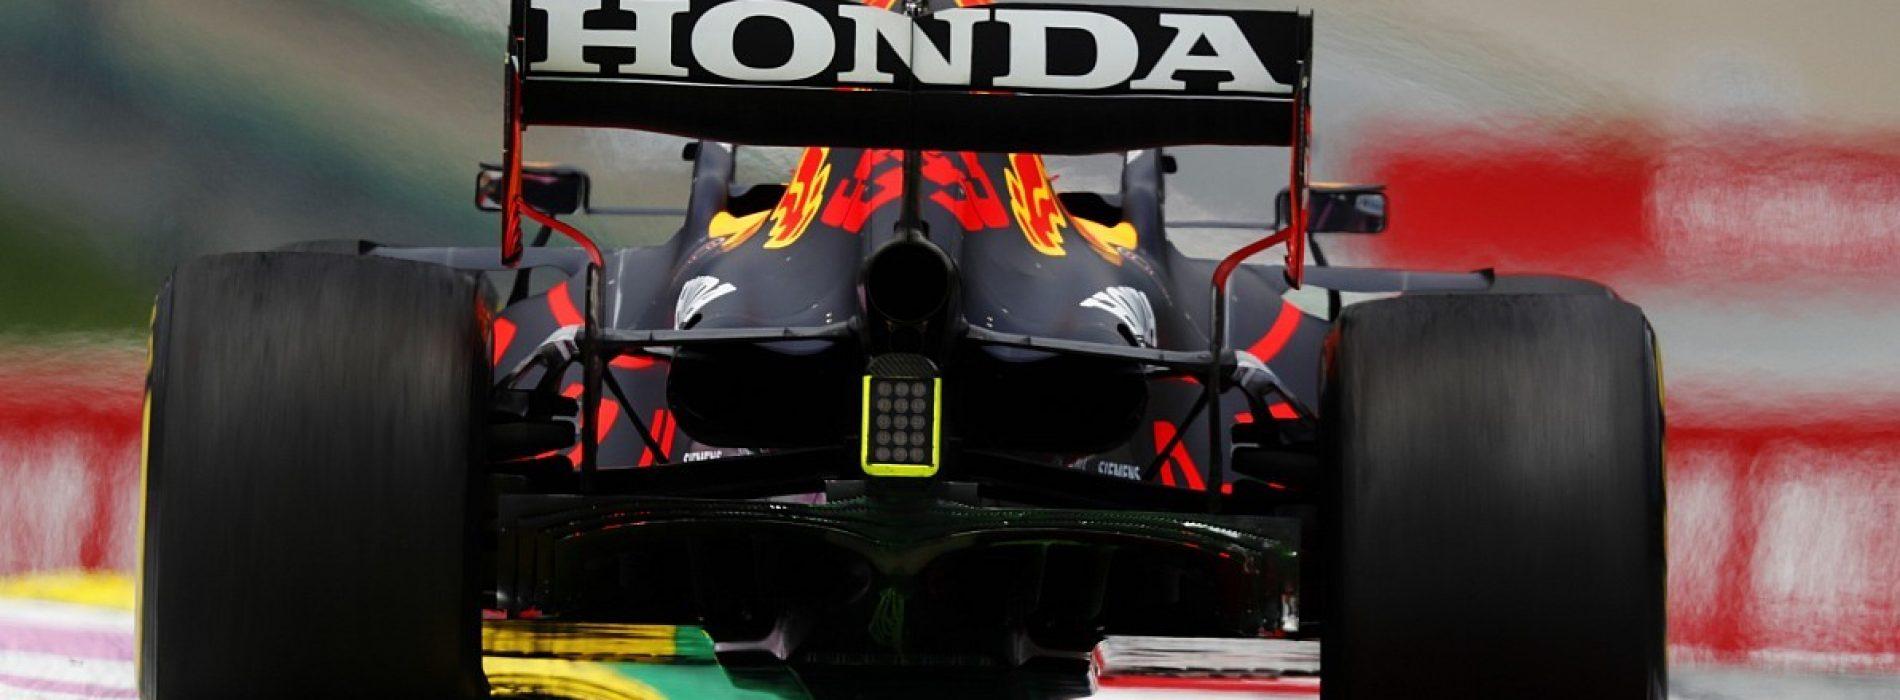 Red Bull Racing Honda- re-writing script on Mercedes dominance in F1